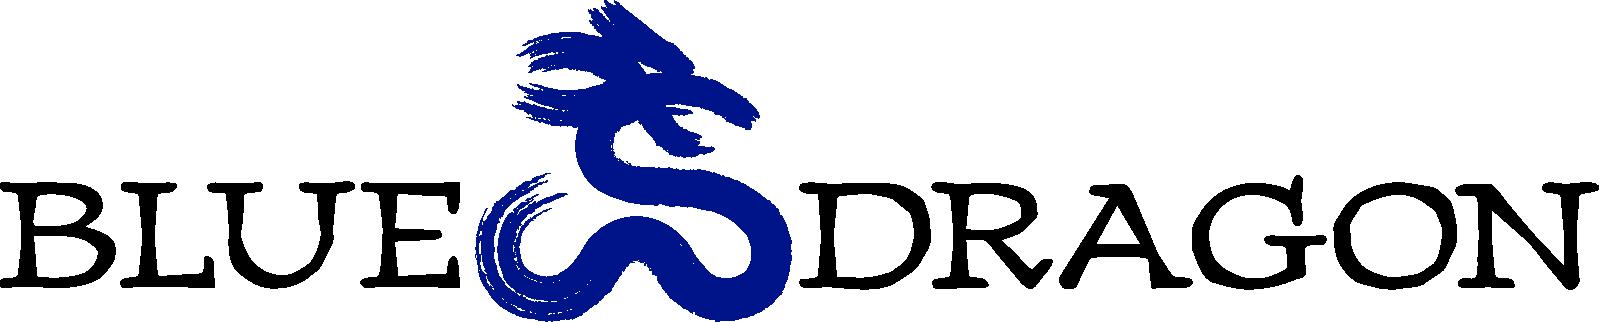 BD_logo_horiz_RGB.png